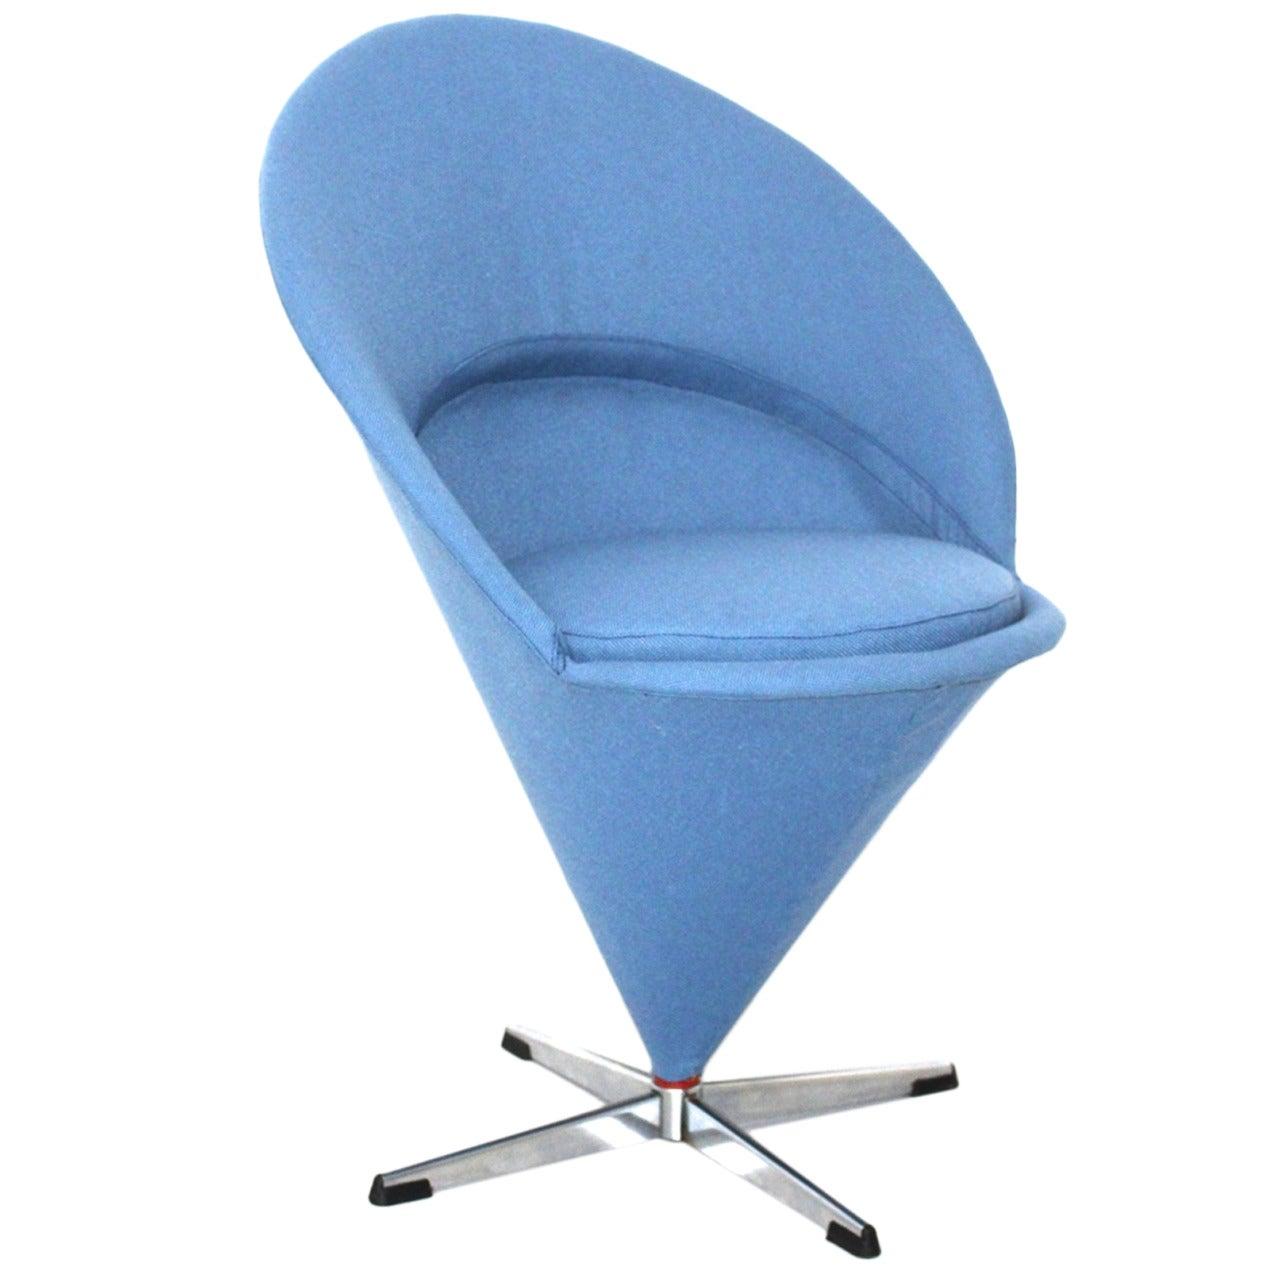 Blue Scandinavian Modern Cone Chair or Side Chair by Verner Panton Denmark 1958